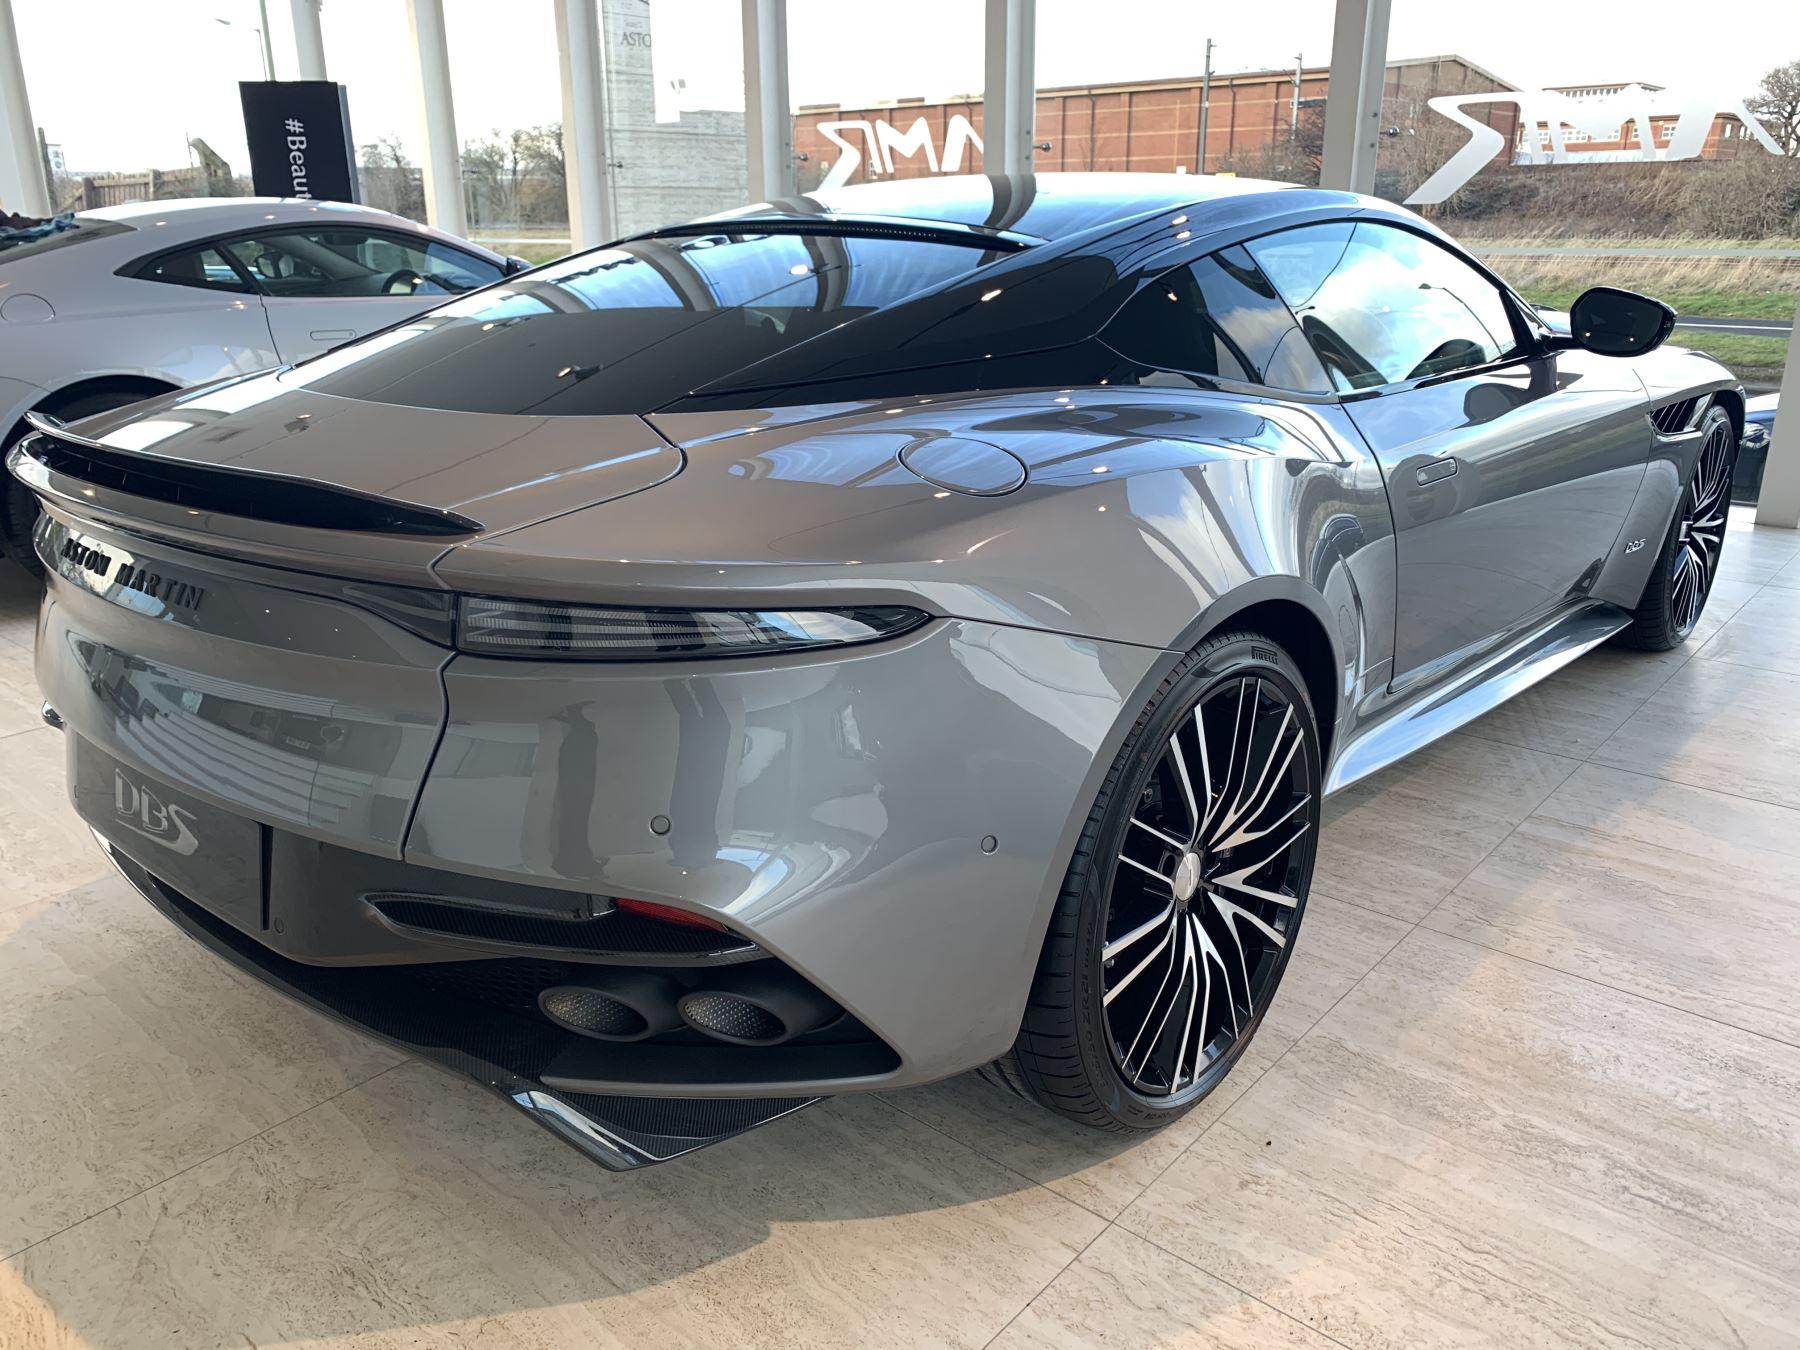 Aston Martin DBS Superleggera V12 Superleggera 2dr Touchtronic Auto image 7